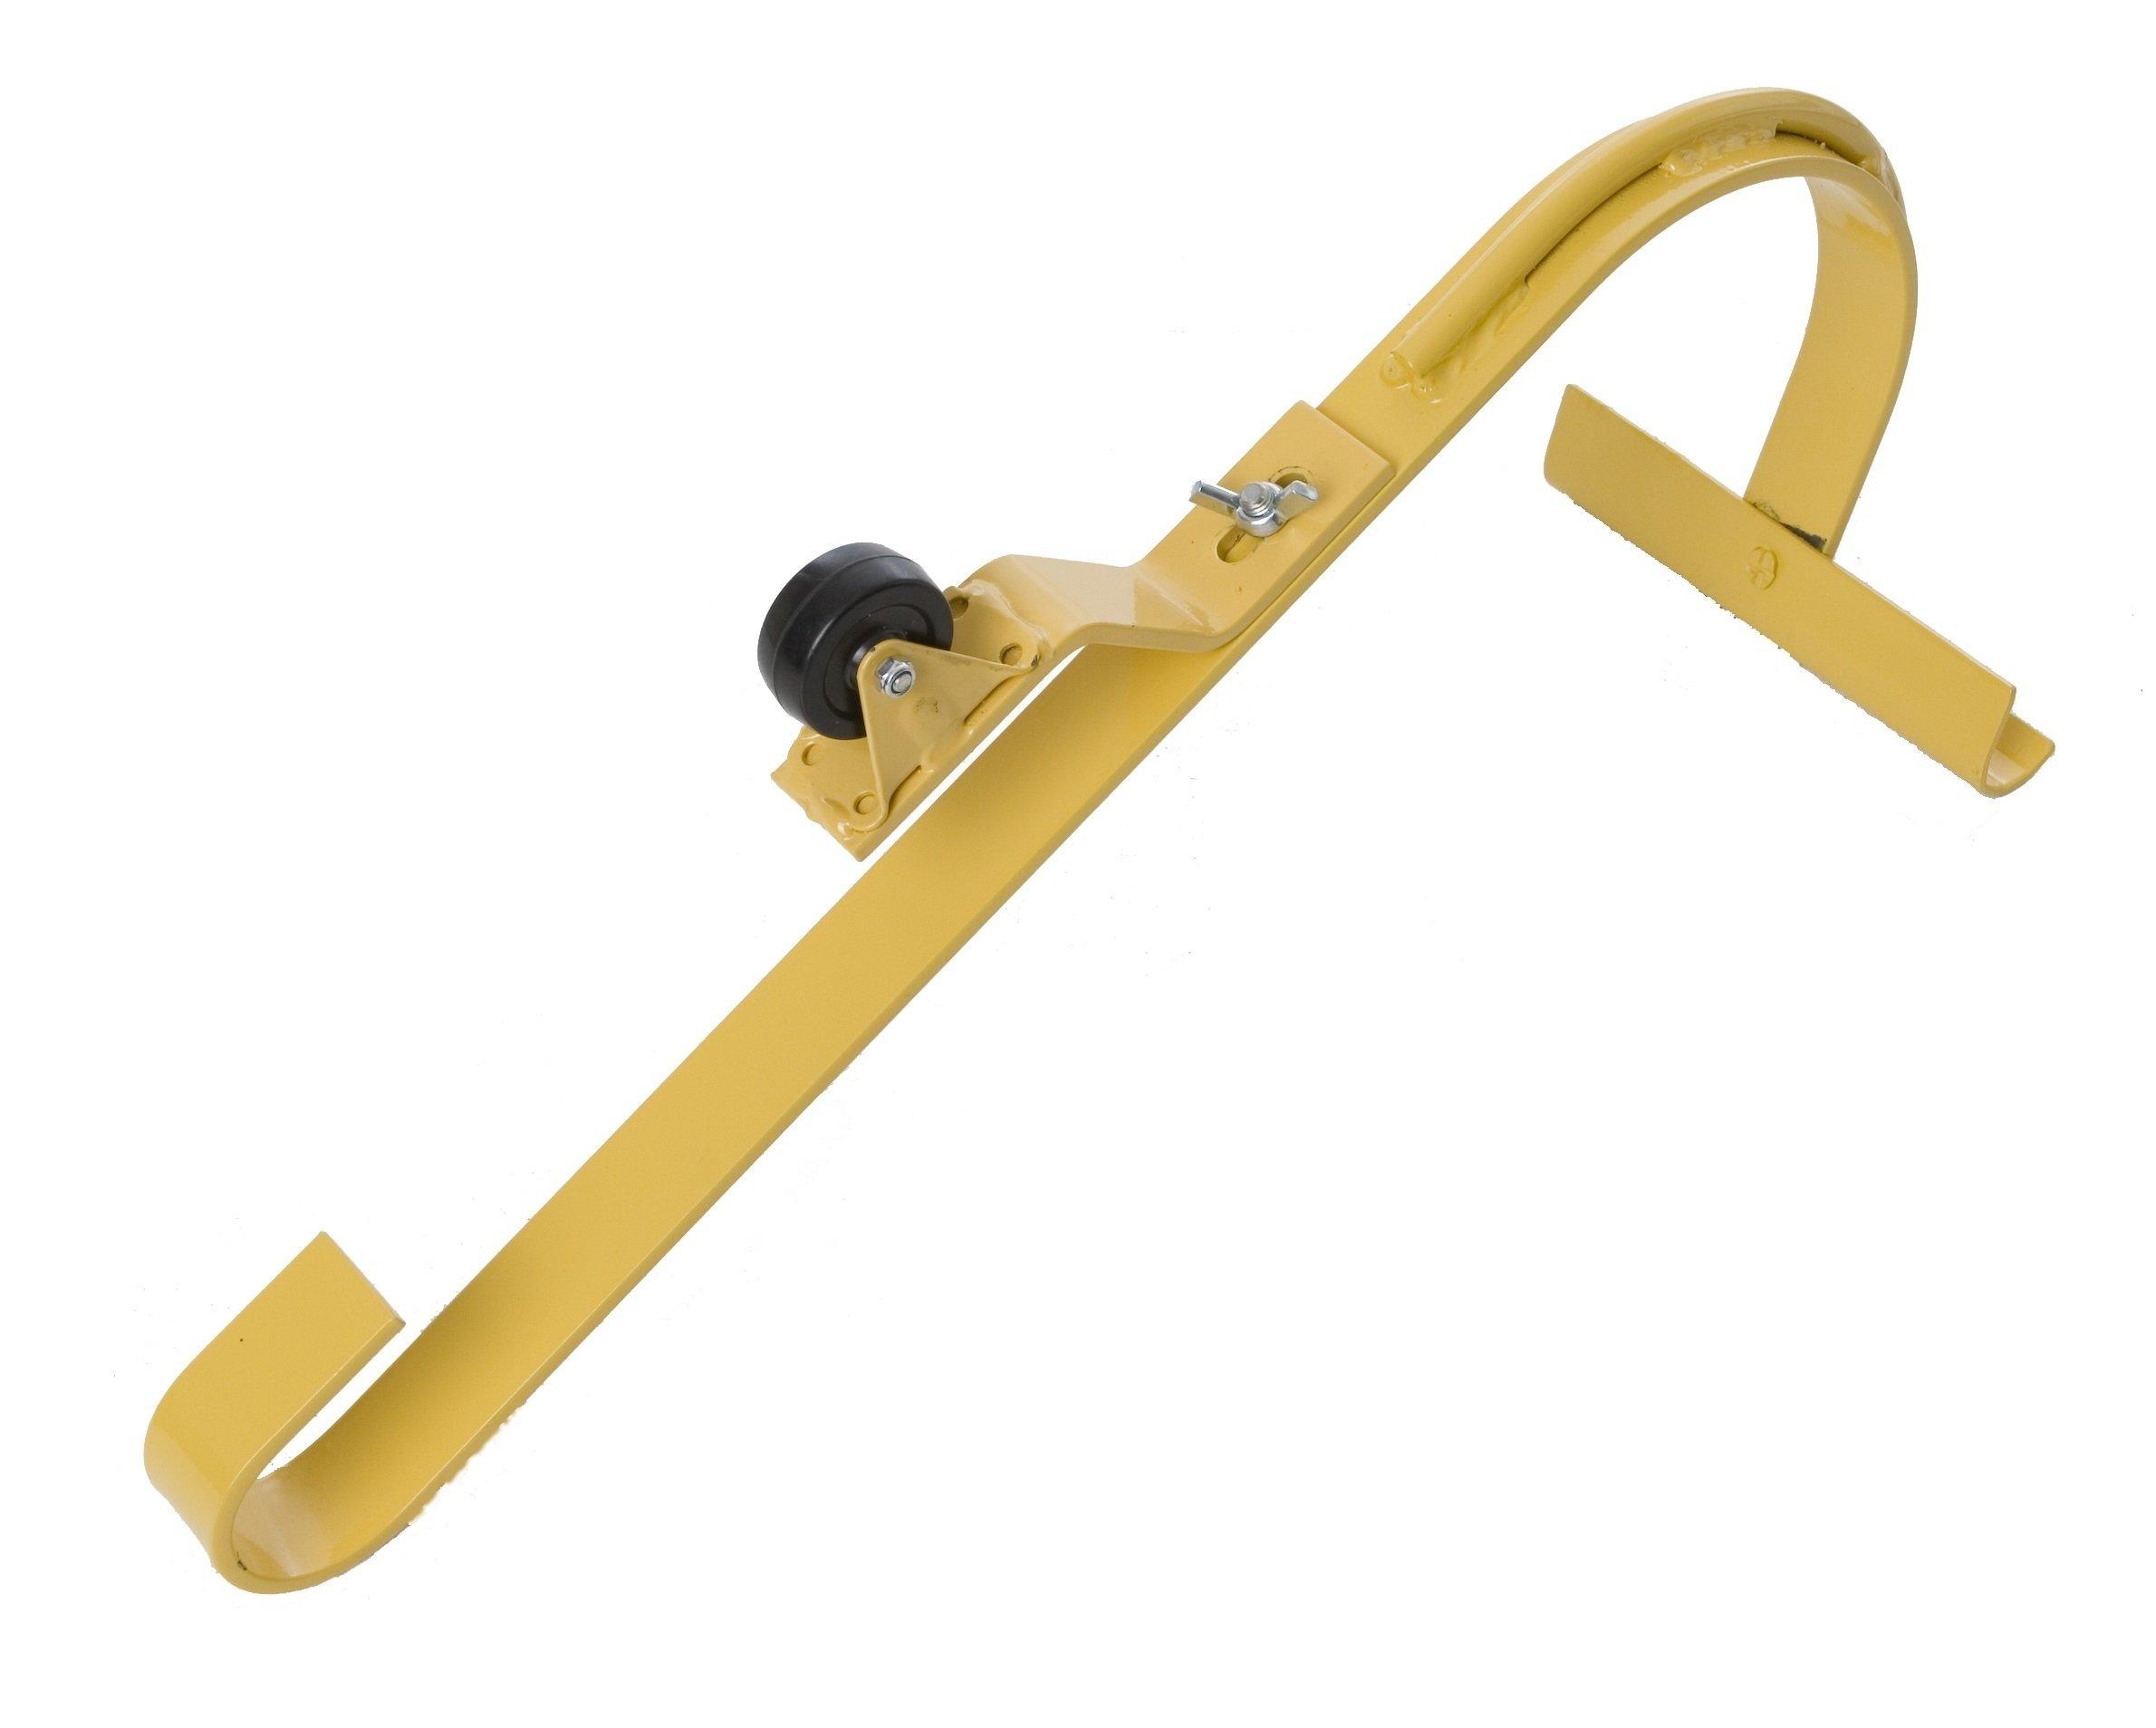 Roof Ridge Ladder Hook With Fixed Wheel & Swivel Bar